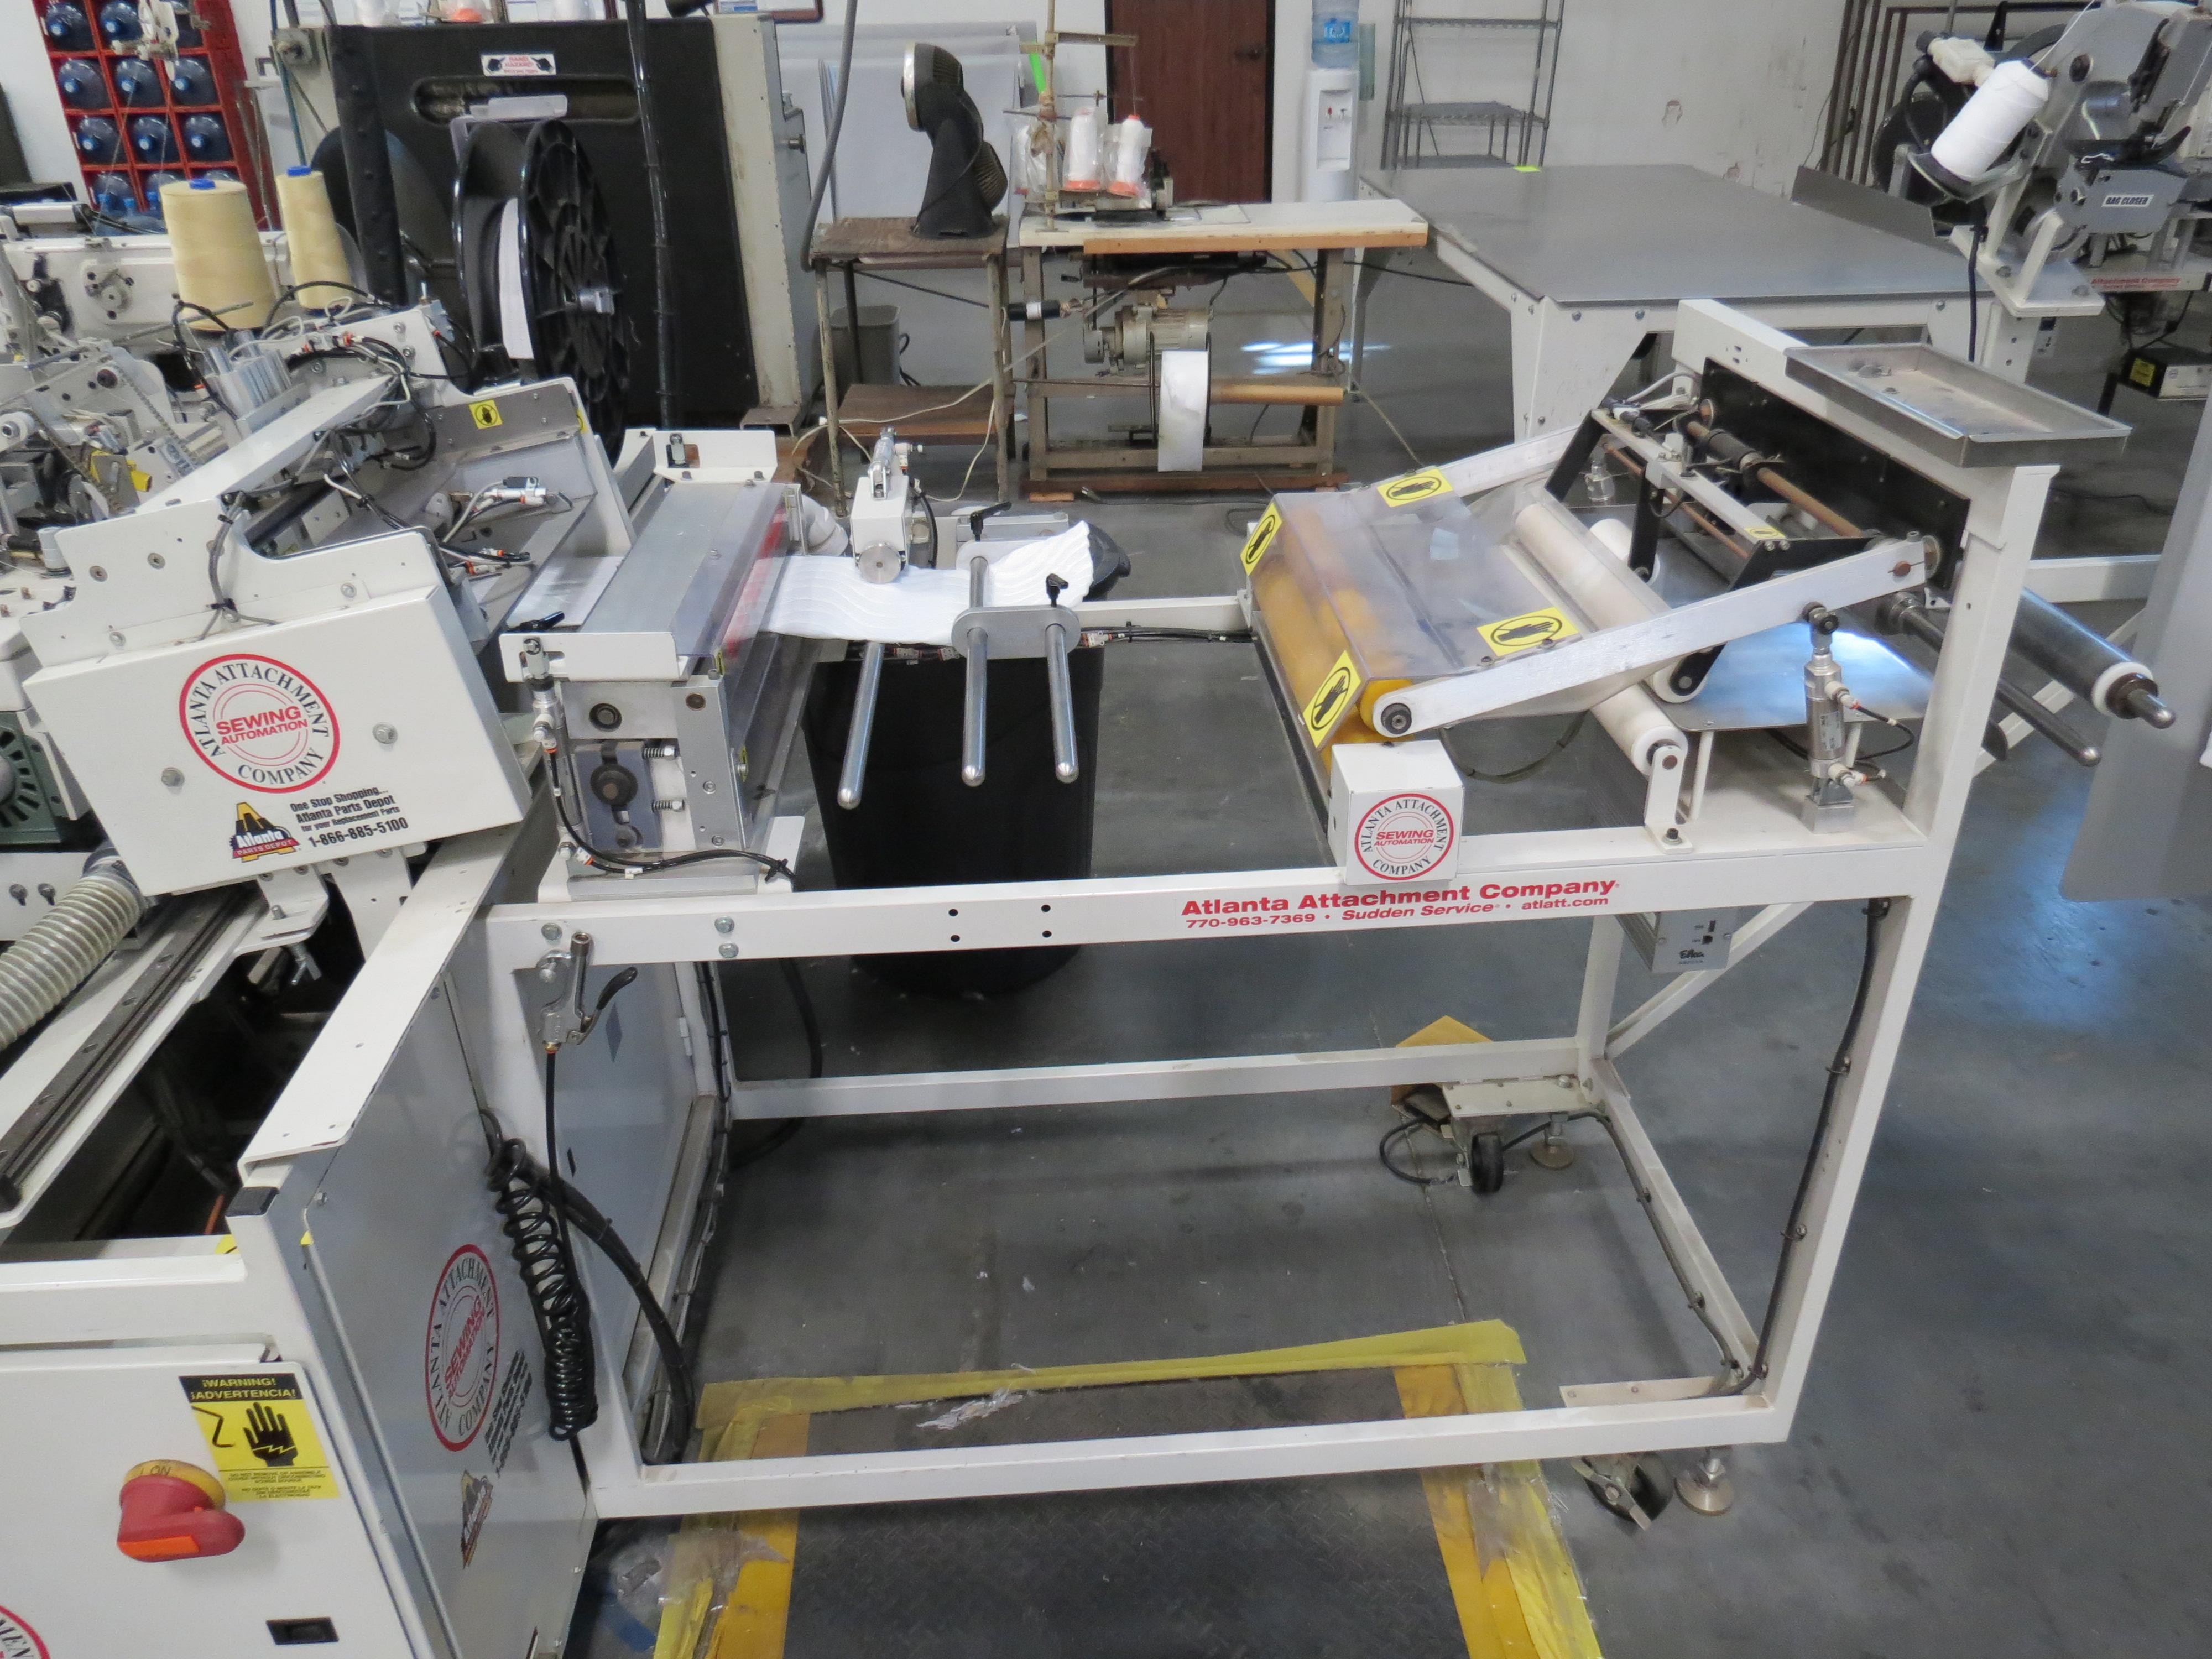 Atlanta Attachment Company, 4300BBorder/Attach Handles Sewing Machine, 220V, SN:209227071609, Juki - Image 9 of 11